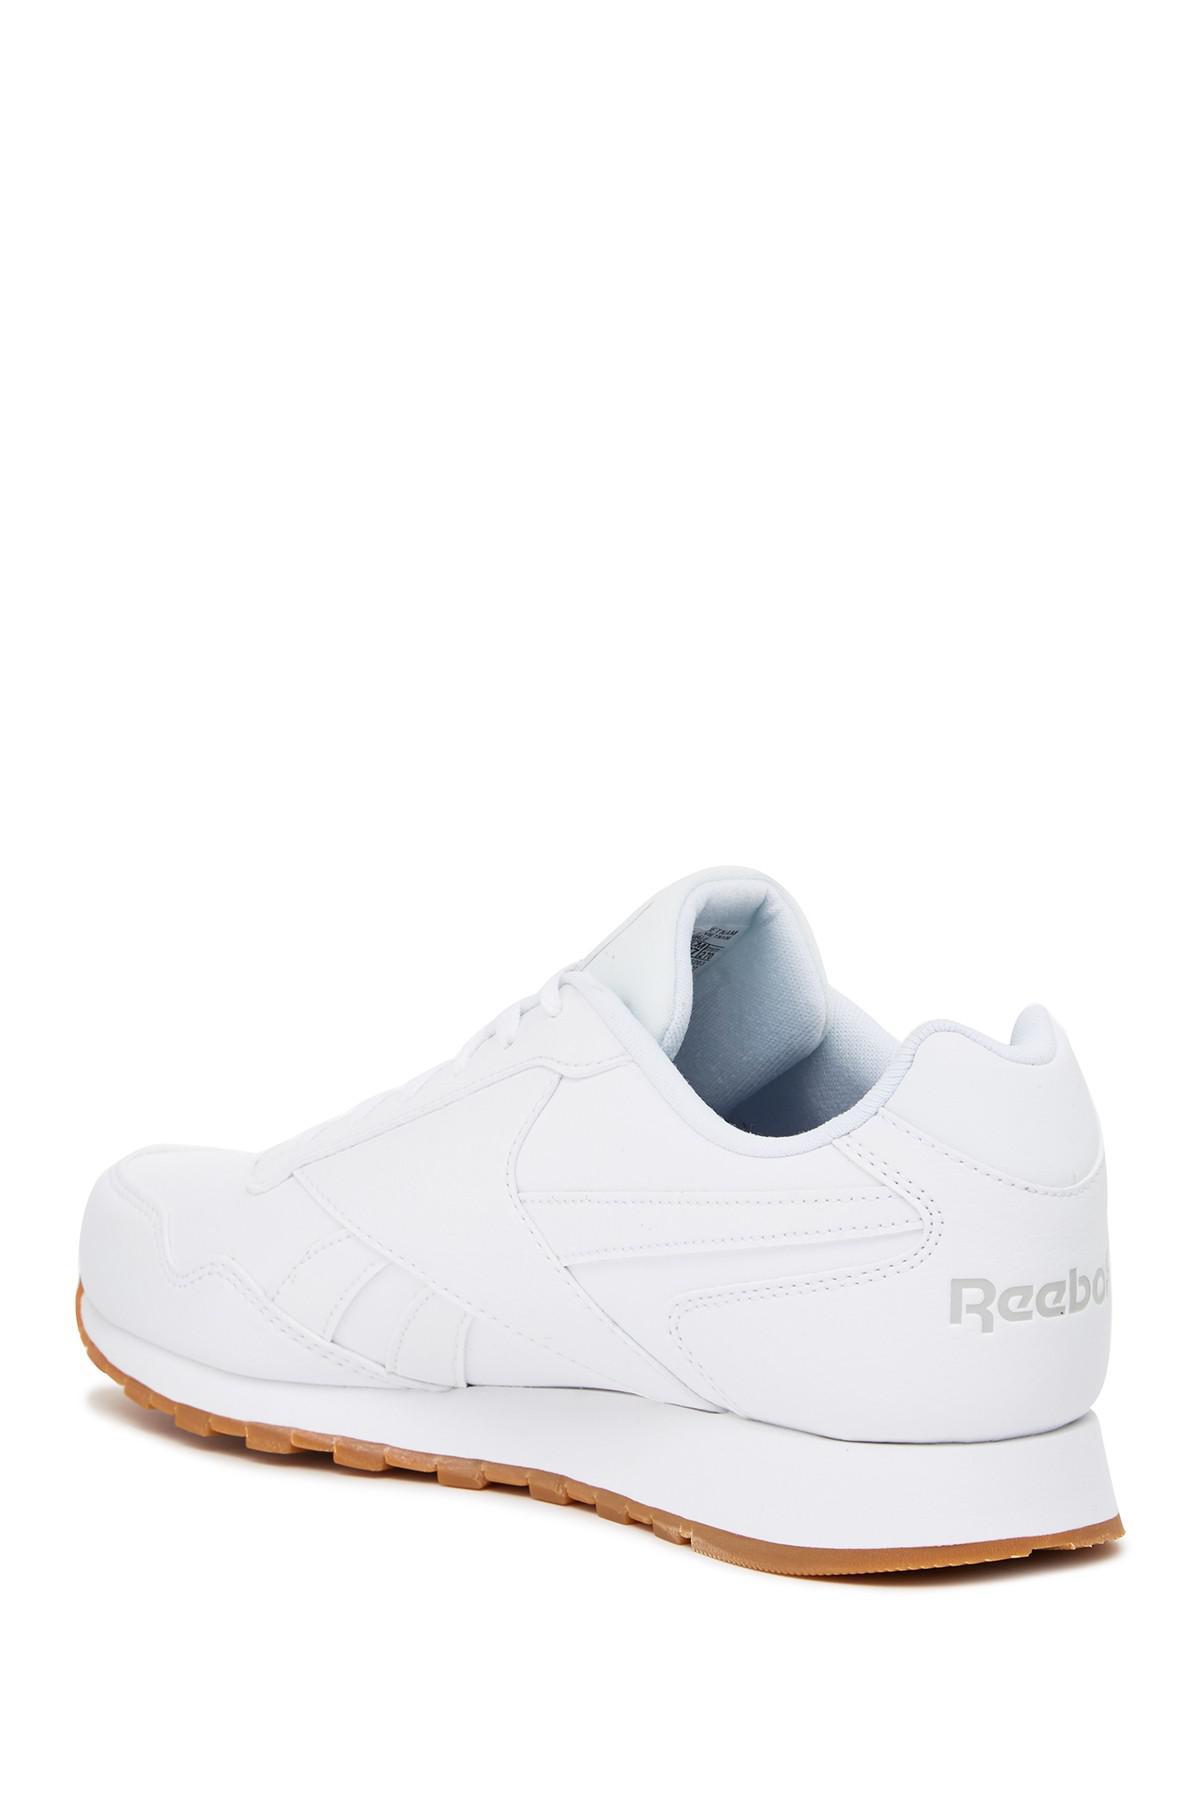 d75d702ecf76c Reebok - Multicolor Classic Harman Running Shoe for Men - Lyst. View  fullscreen